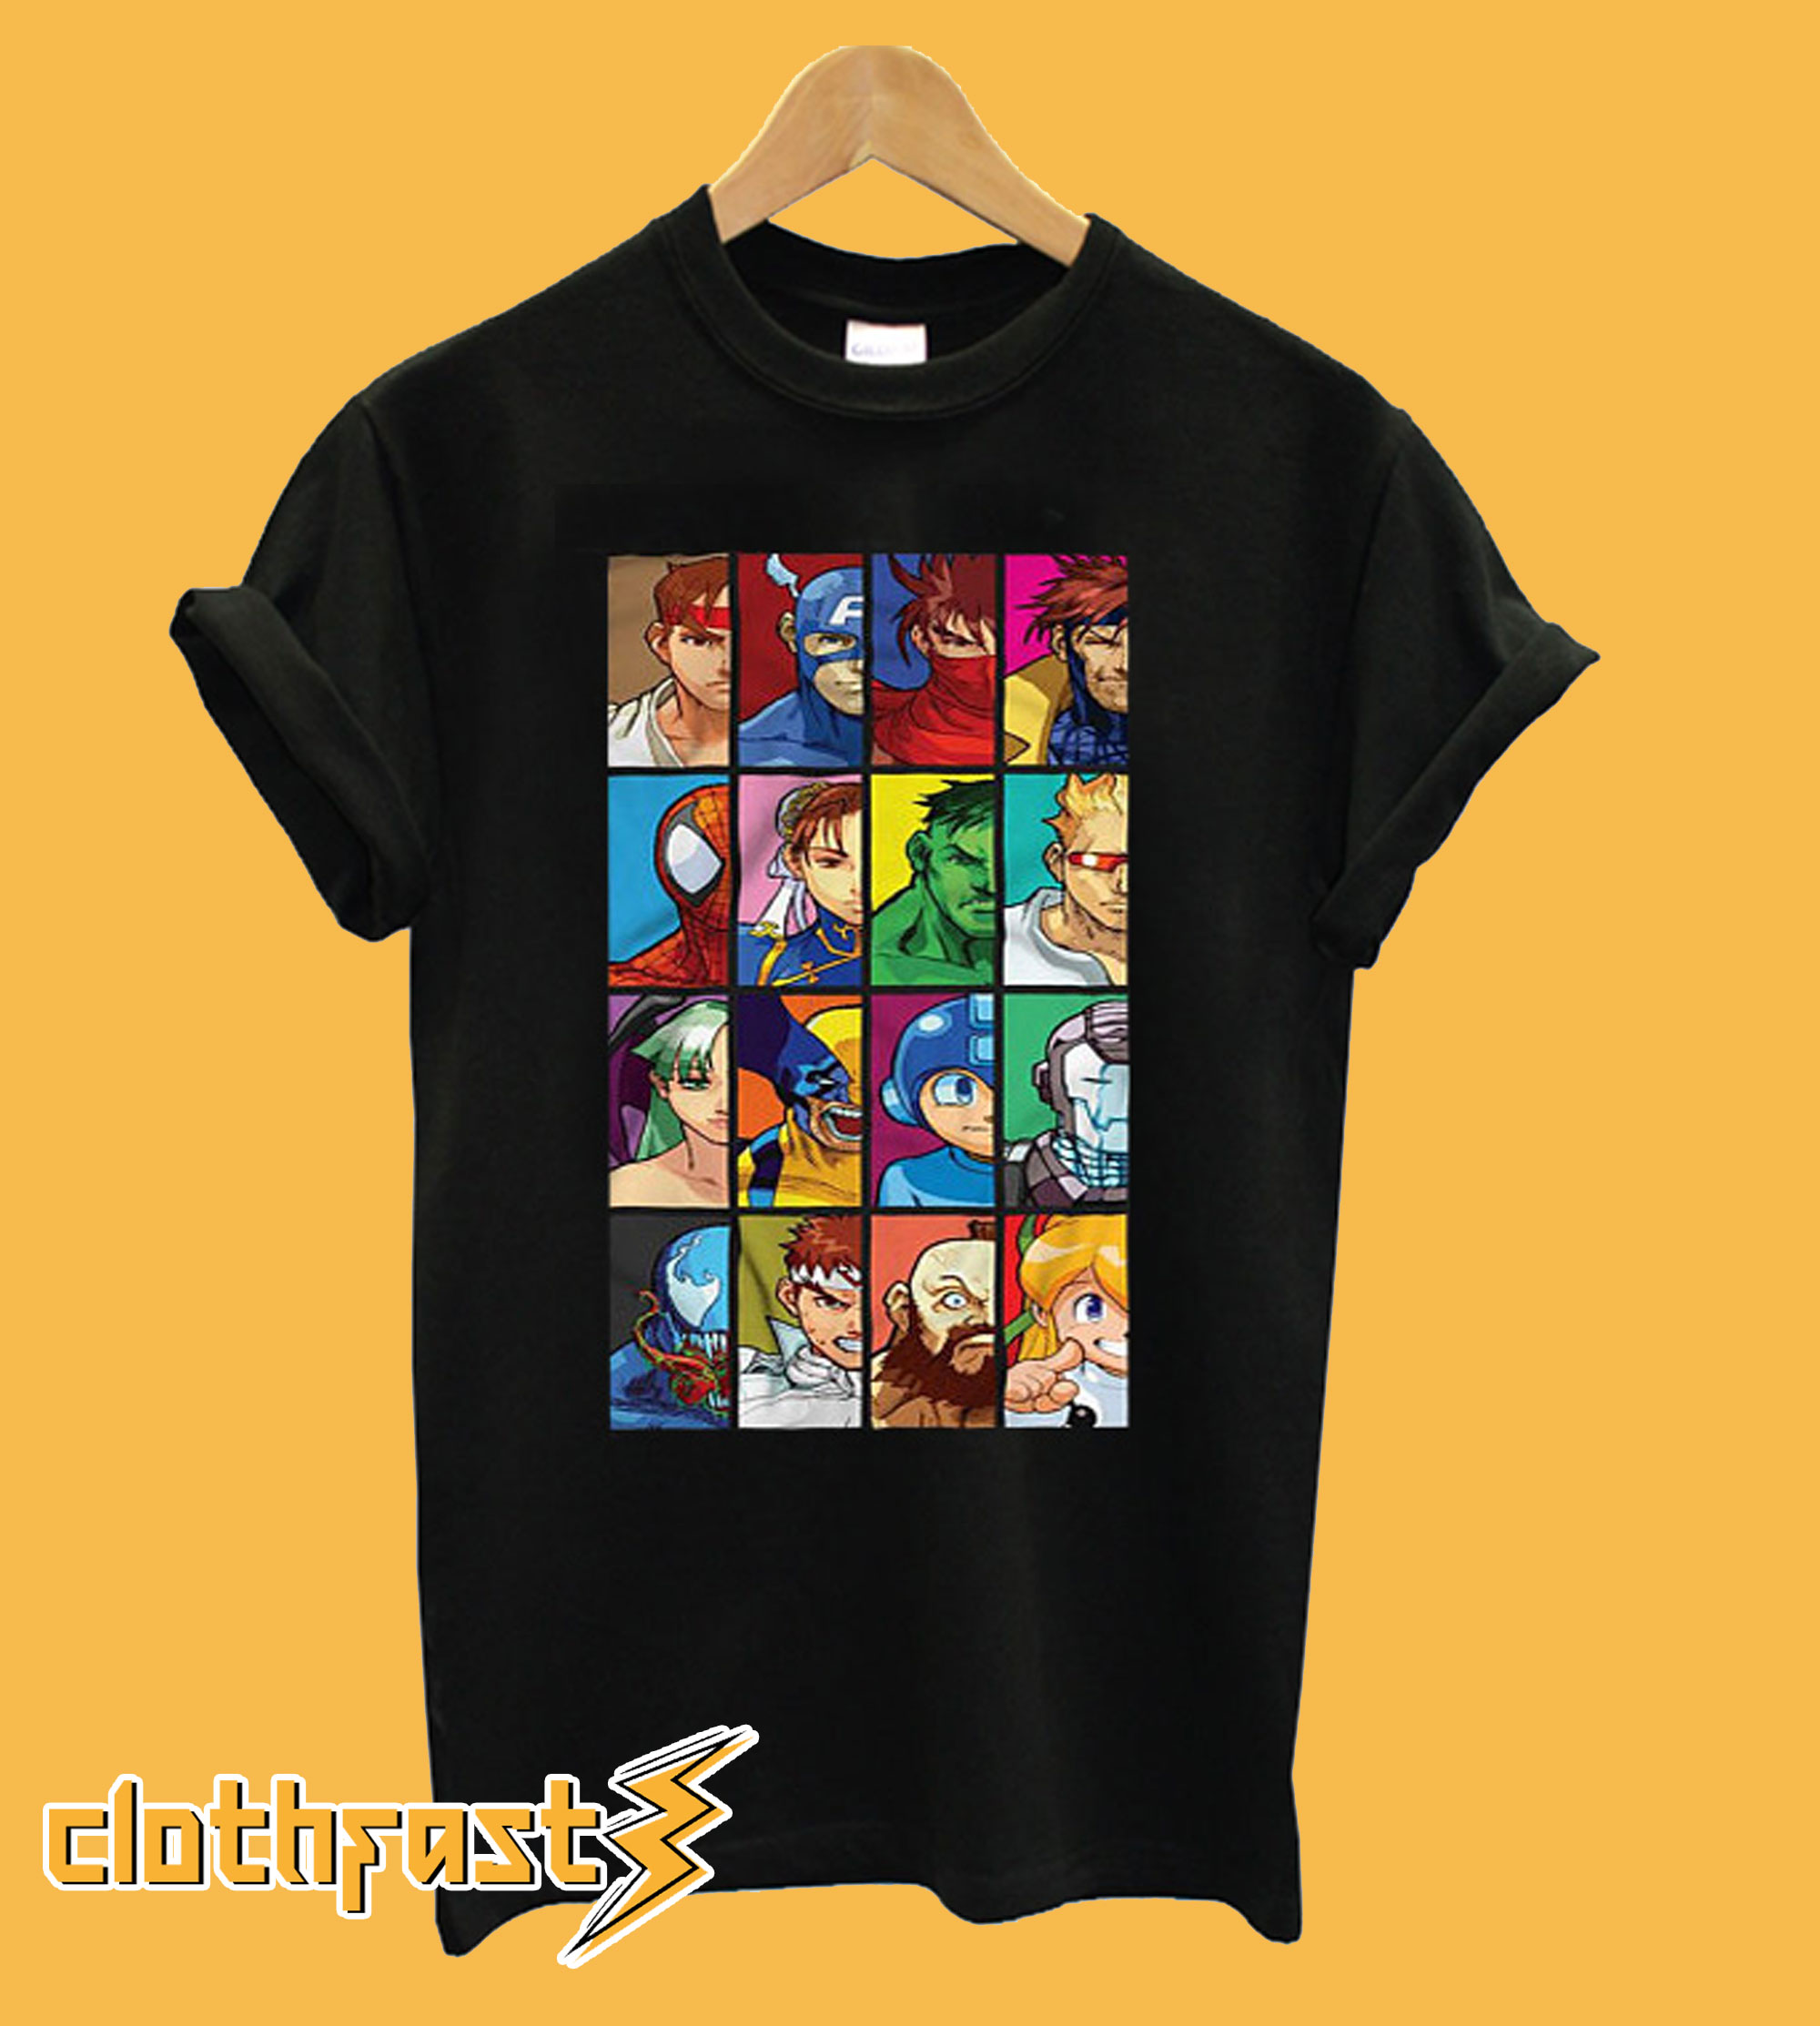 Marvel Vs Capcom T-Shirt